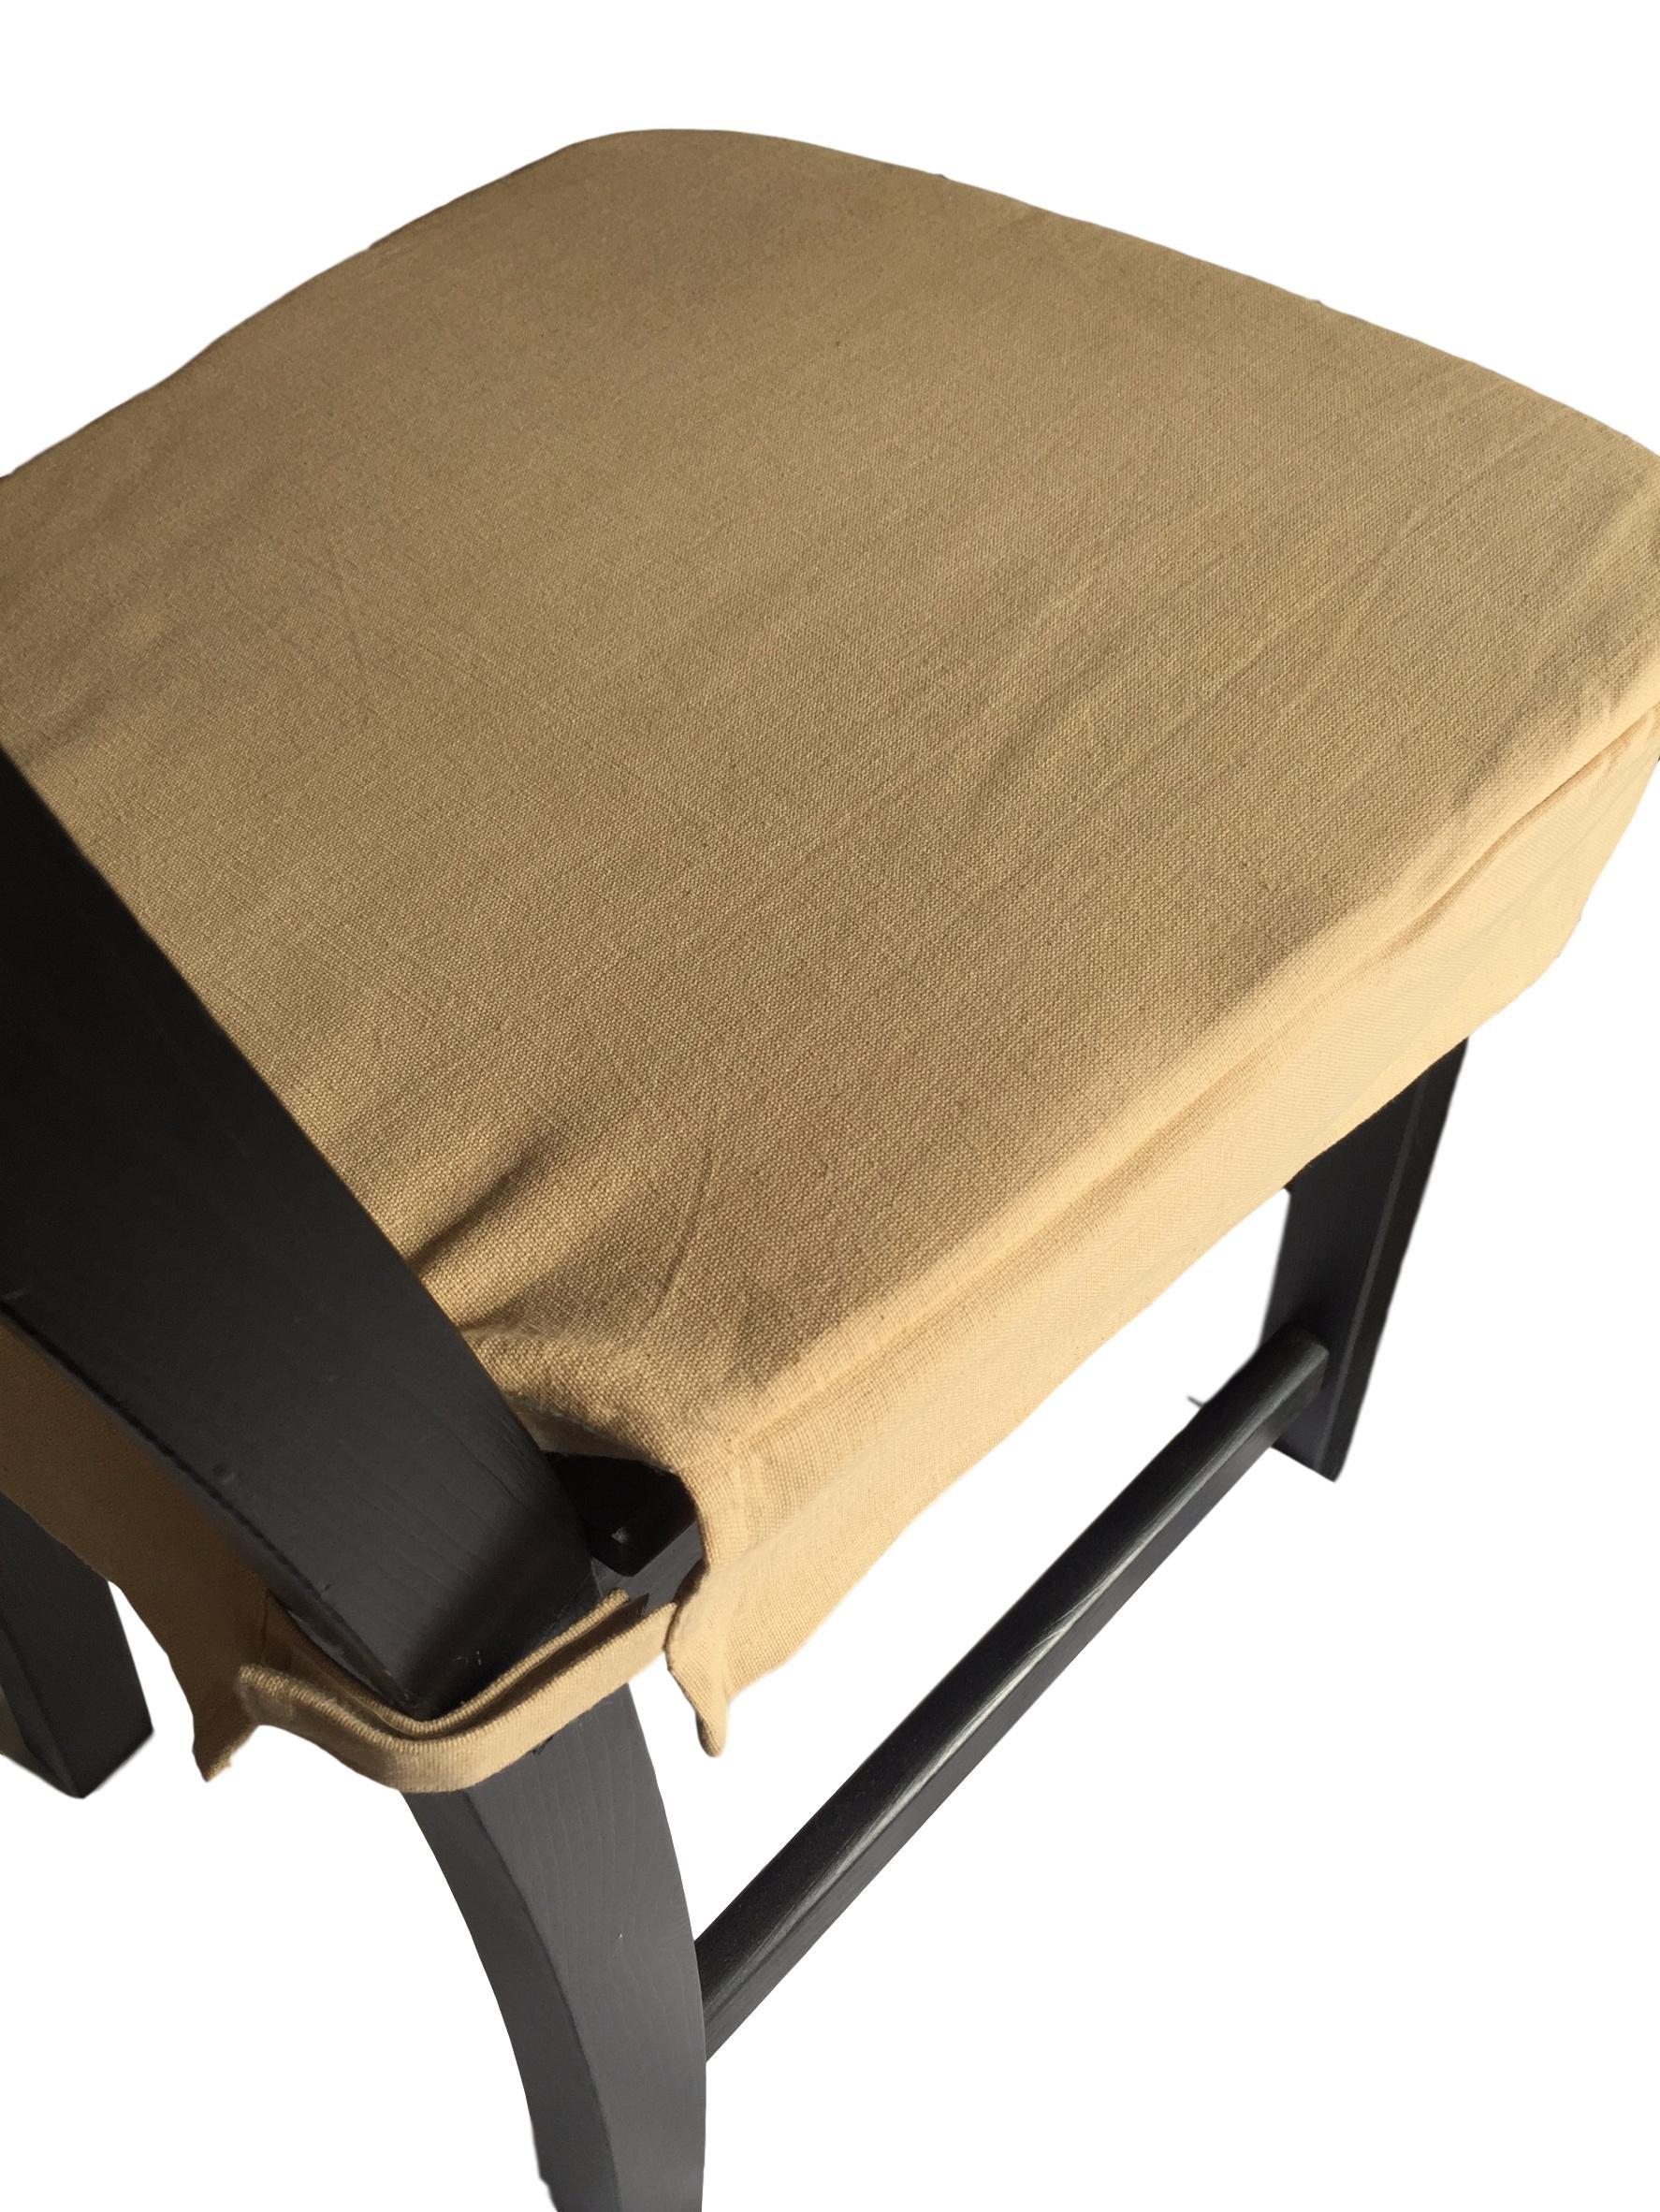 4 Chair Pads 100% Cotton (Beige)